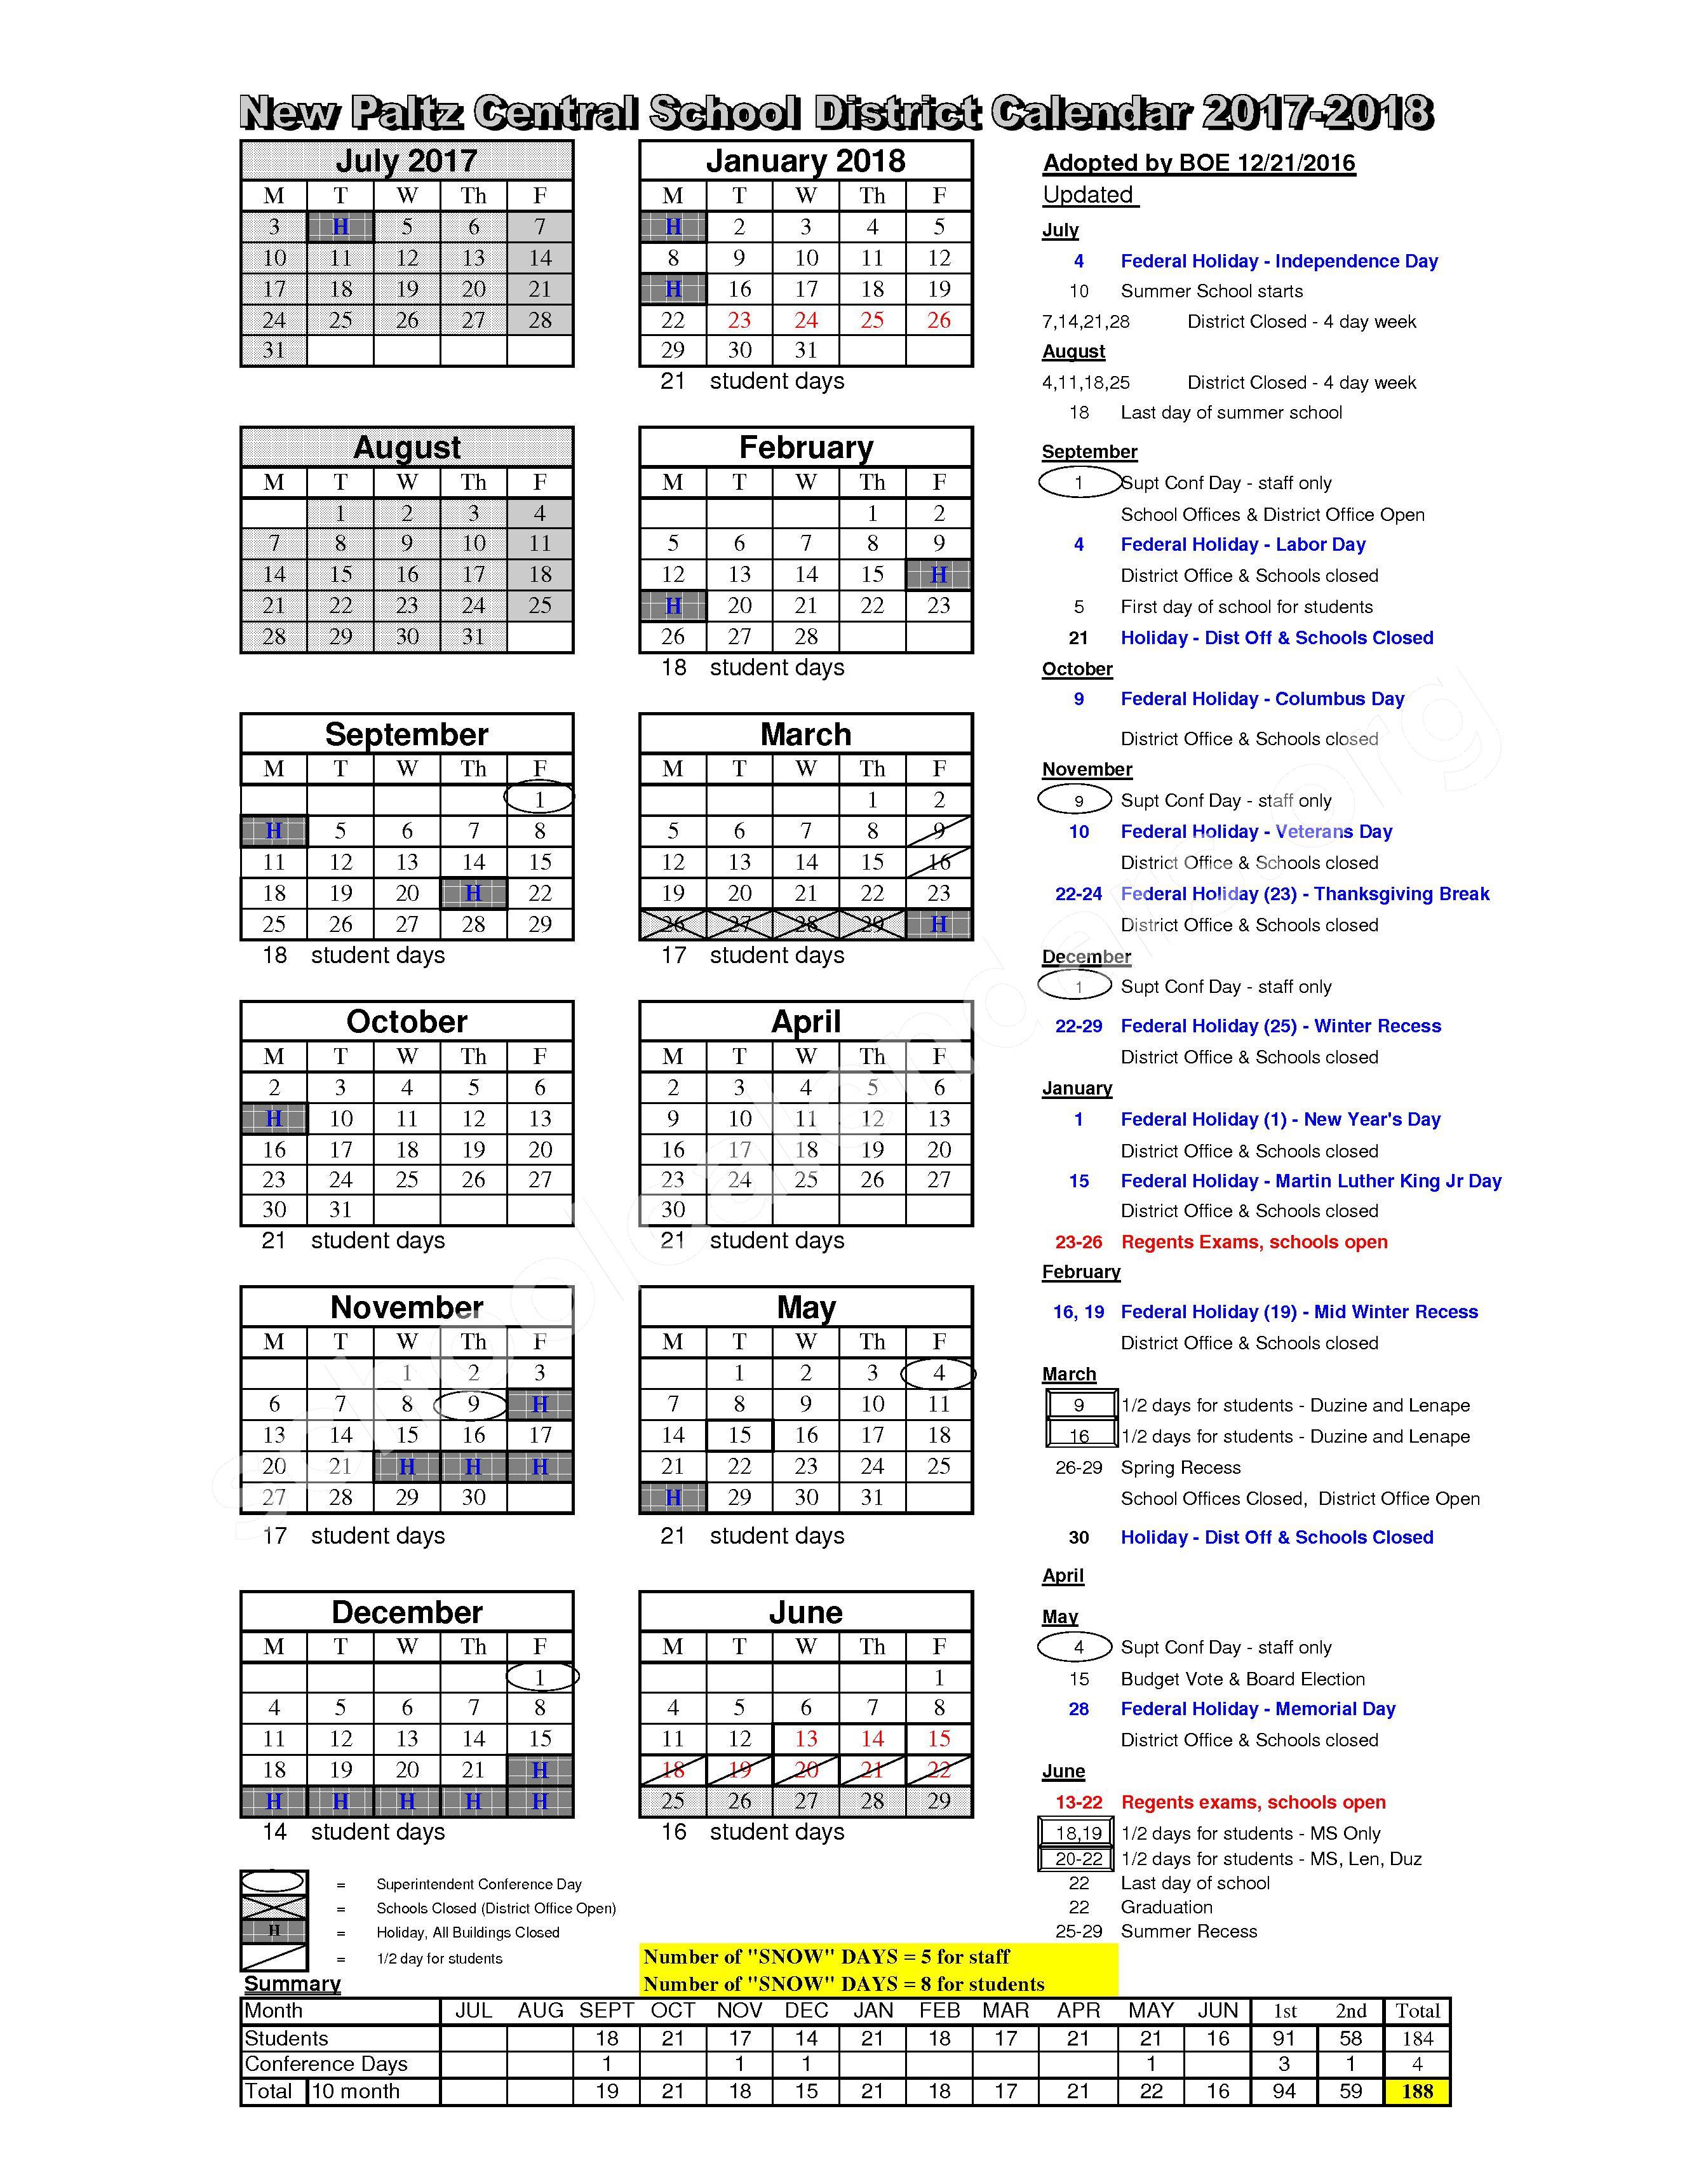 2017 - 2018 District Calendar – New Paltz Central School District – page 1